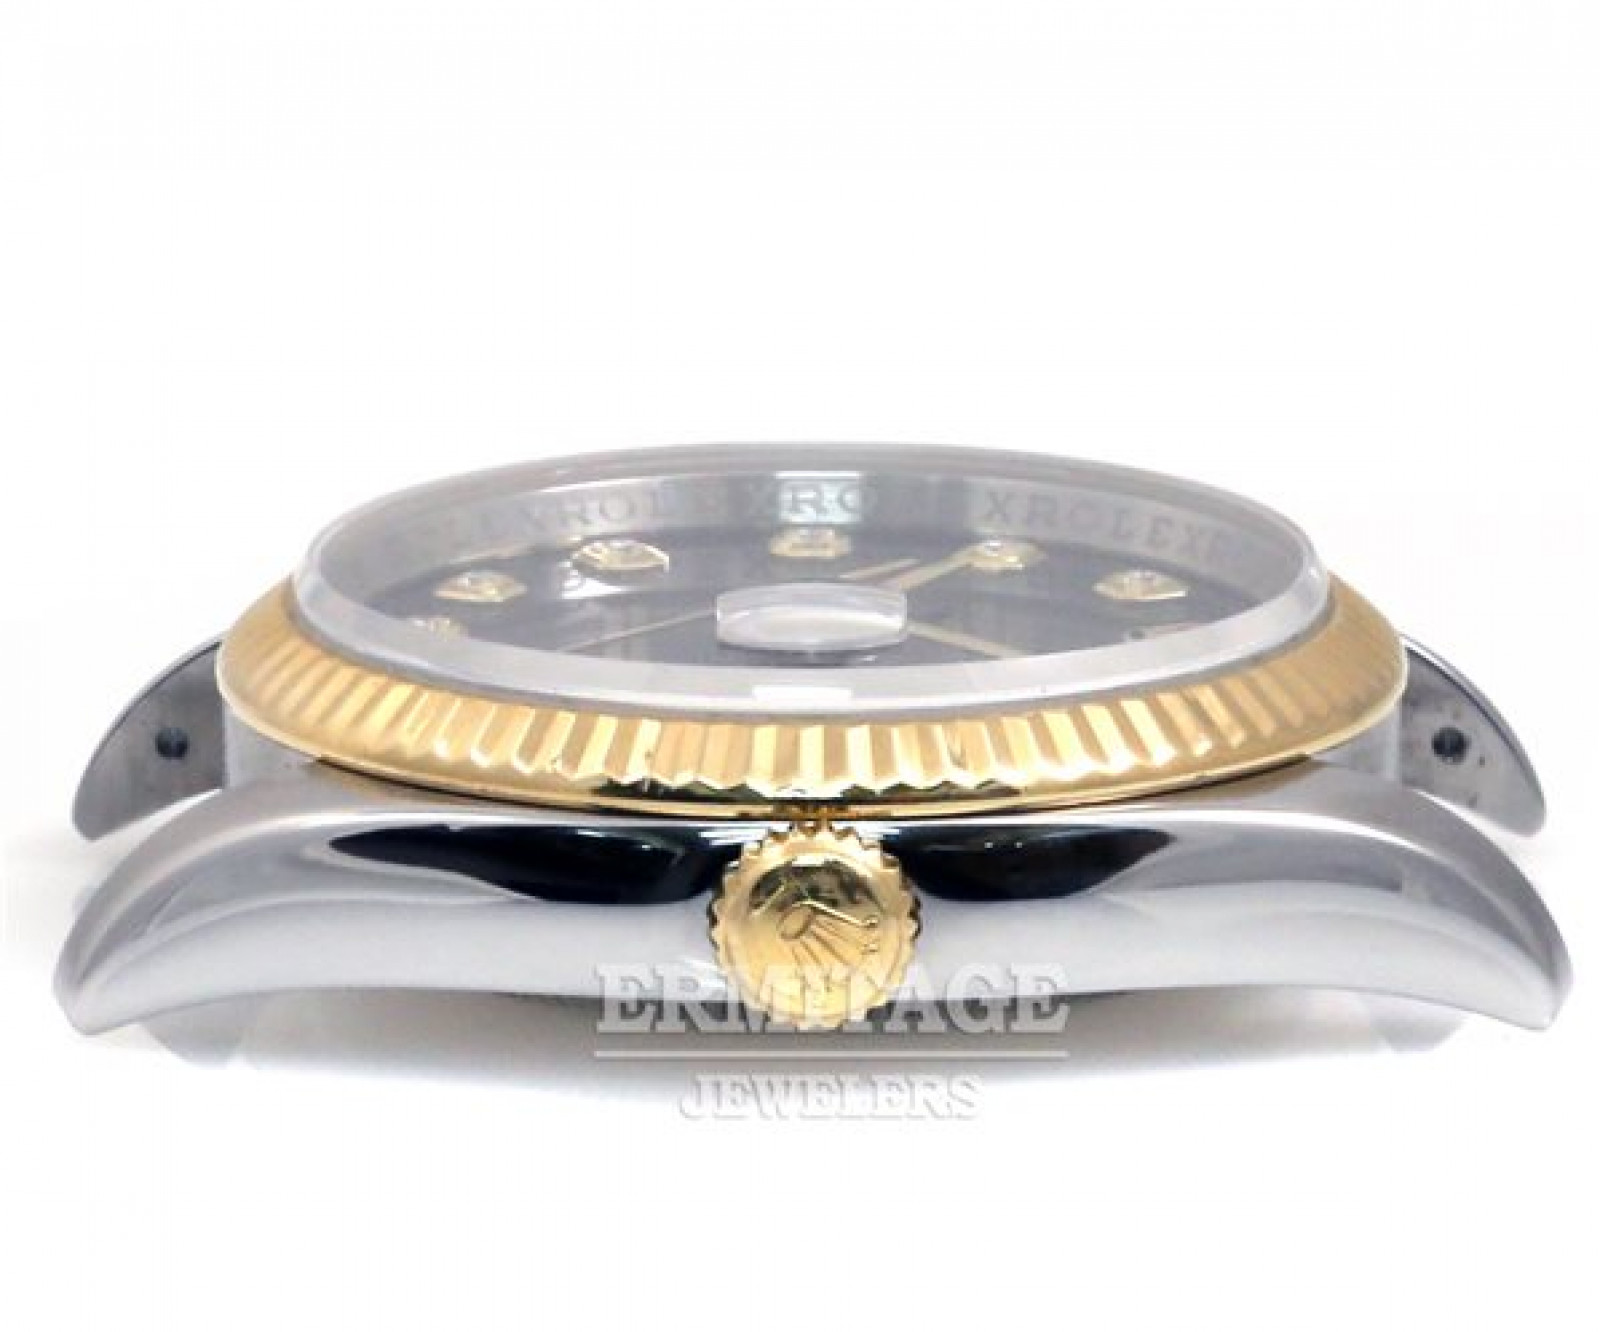 Diamond Rolex Datejust 116233 Gold & Steel